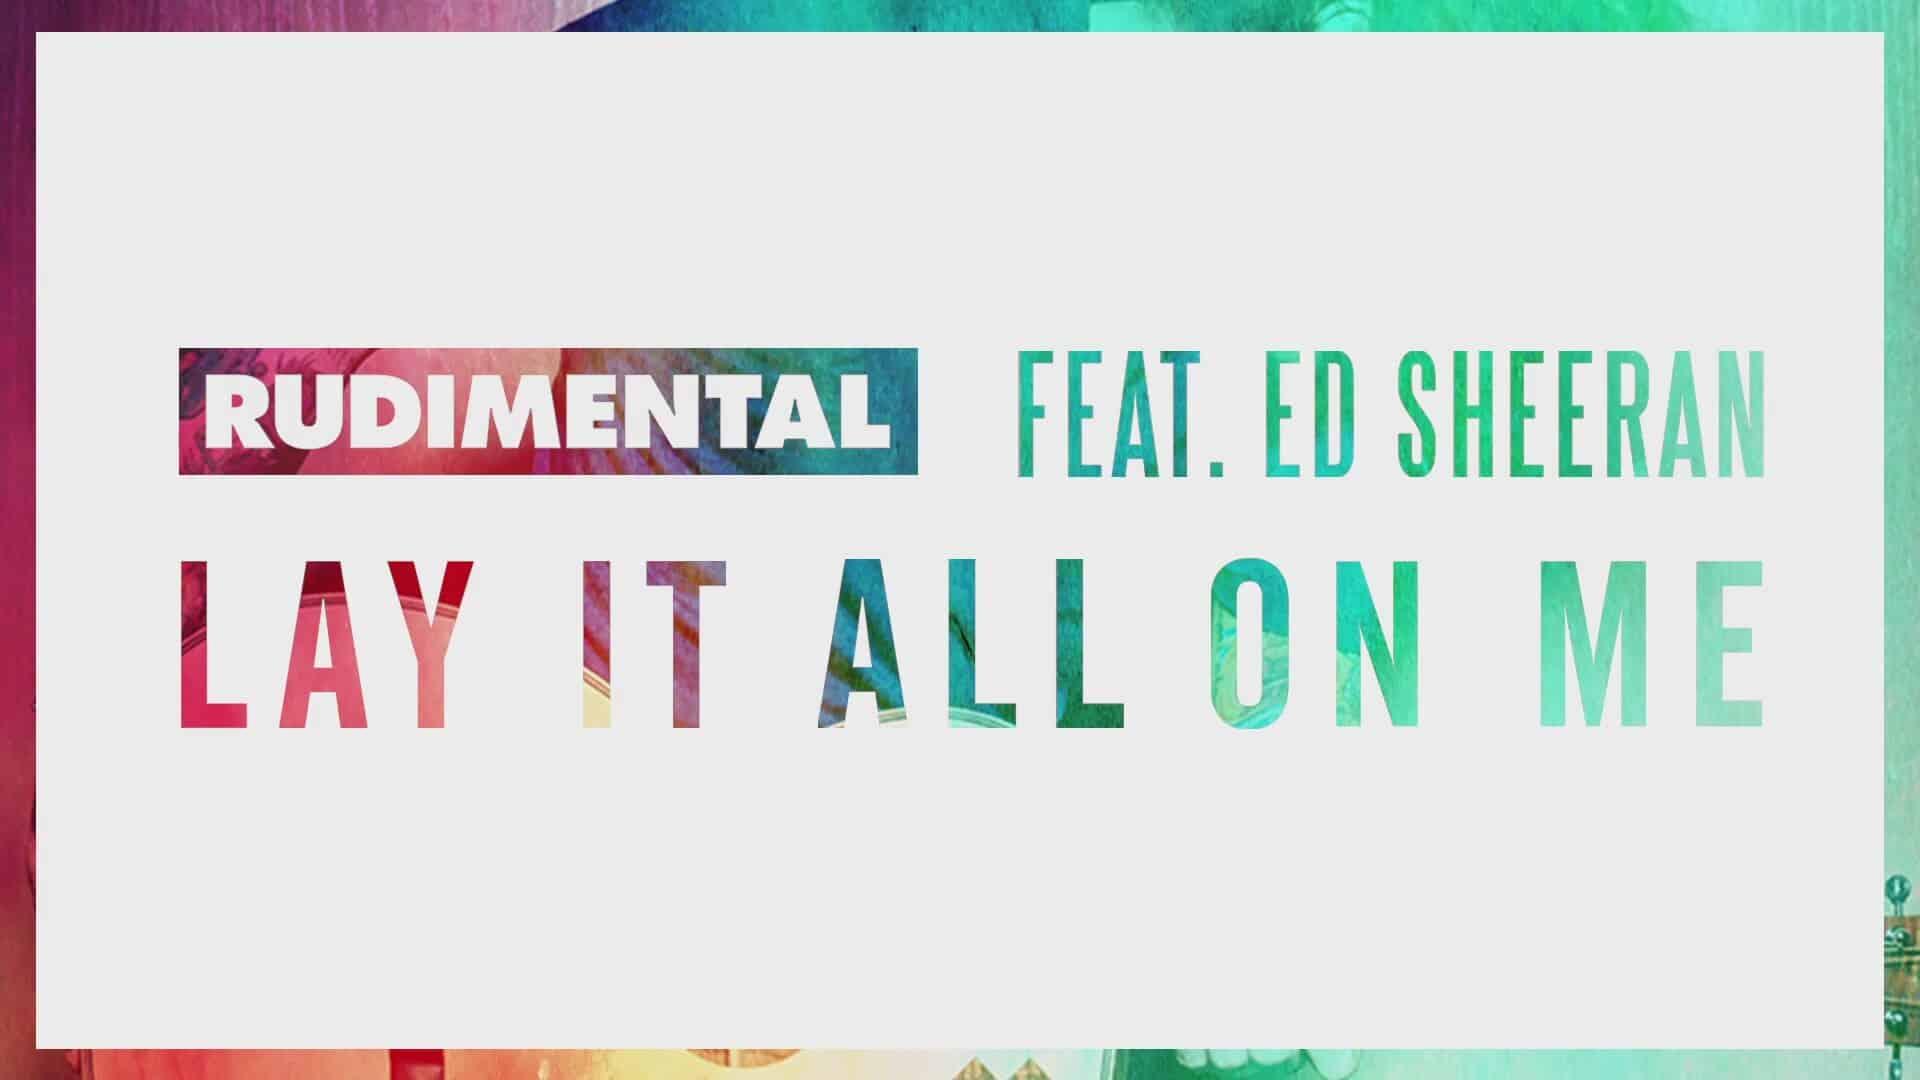 rudimental-feat-ed-sheeran-lay-it-all-on-me_8972747-23530_1920x1080